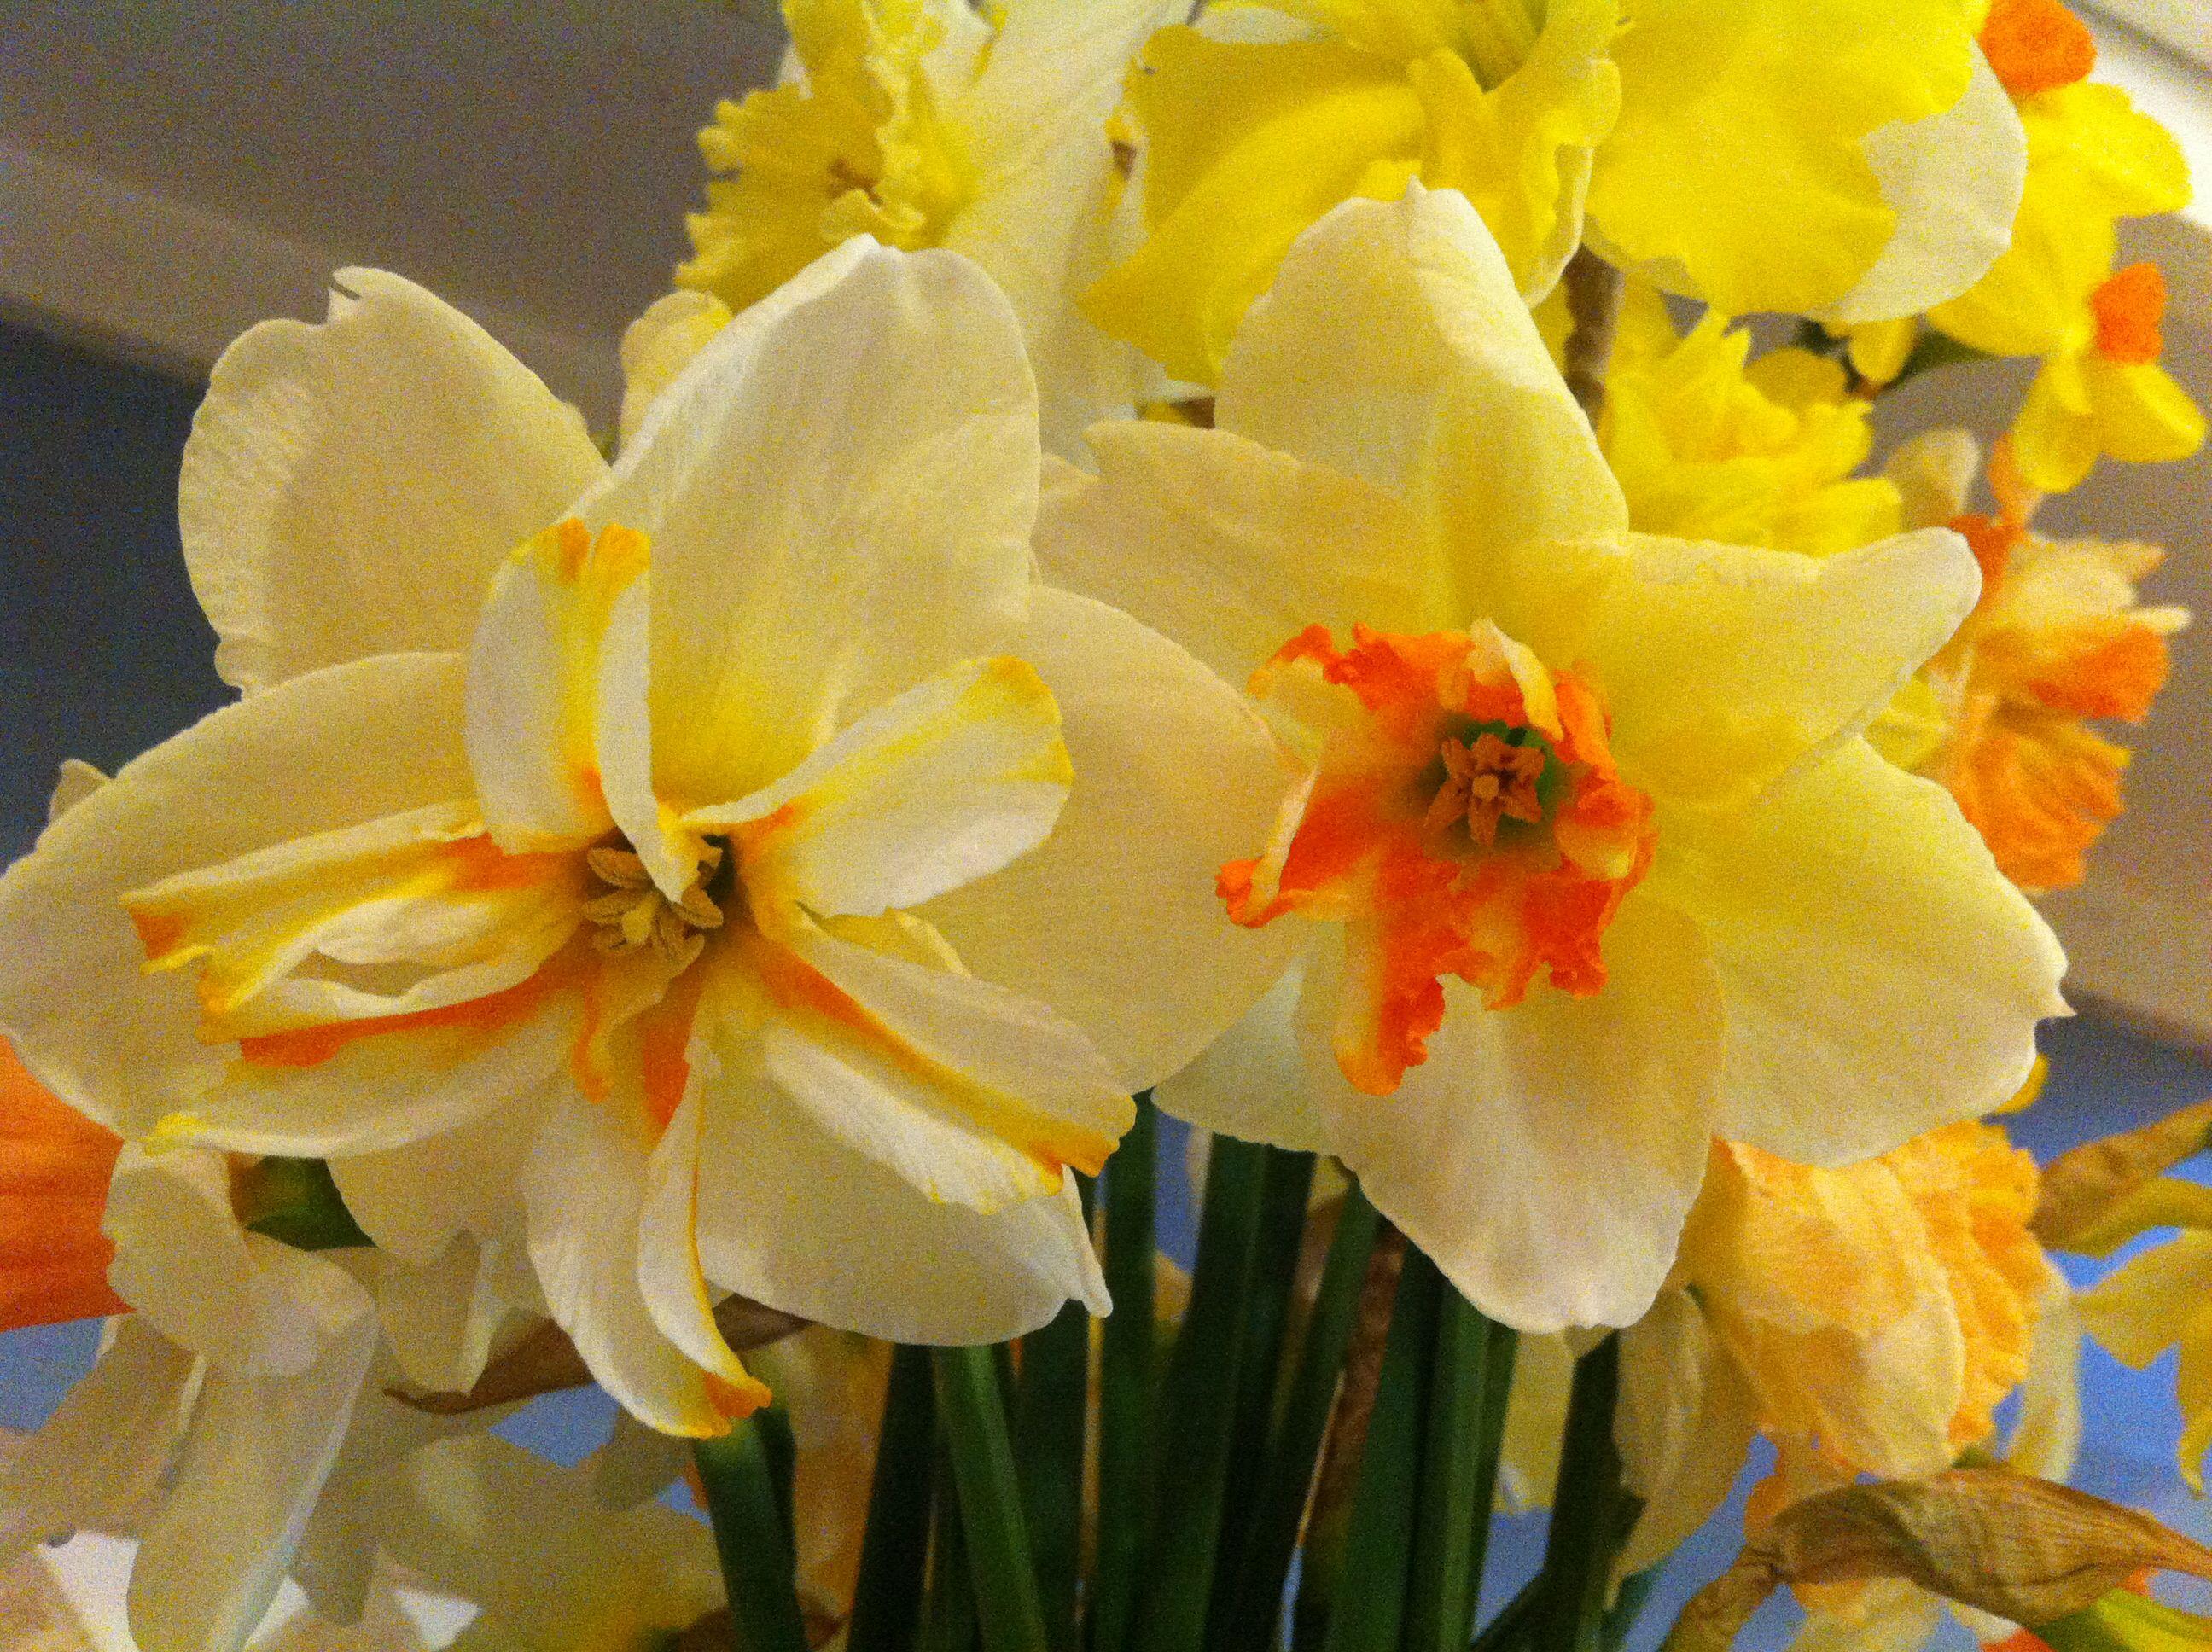 Star Cup Daffodil My Garden Pinterest Daffodils And Gardens